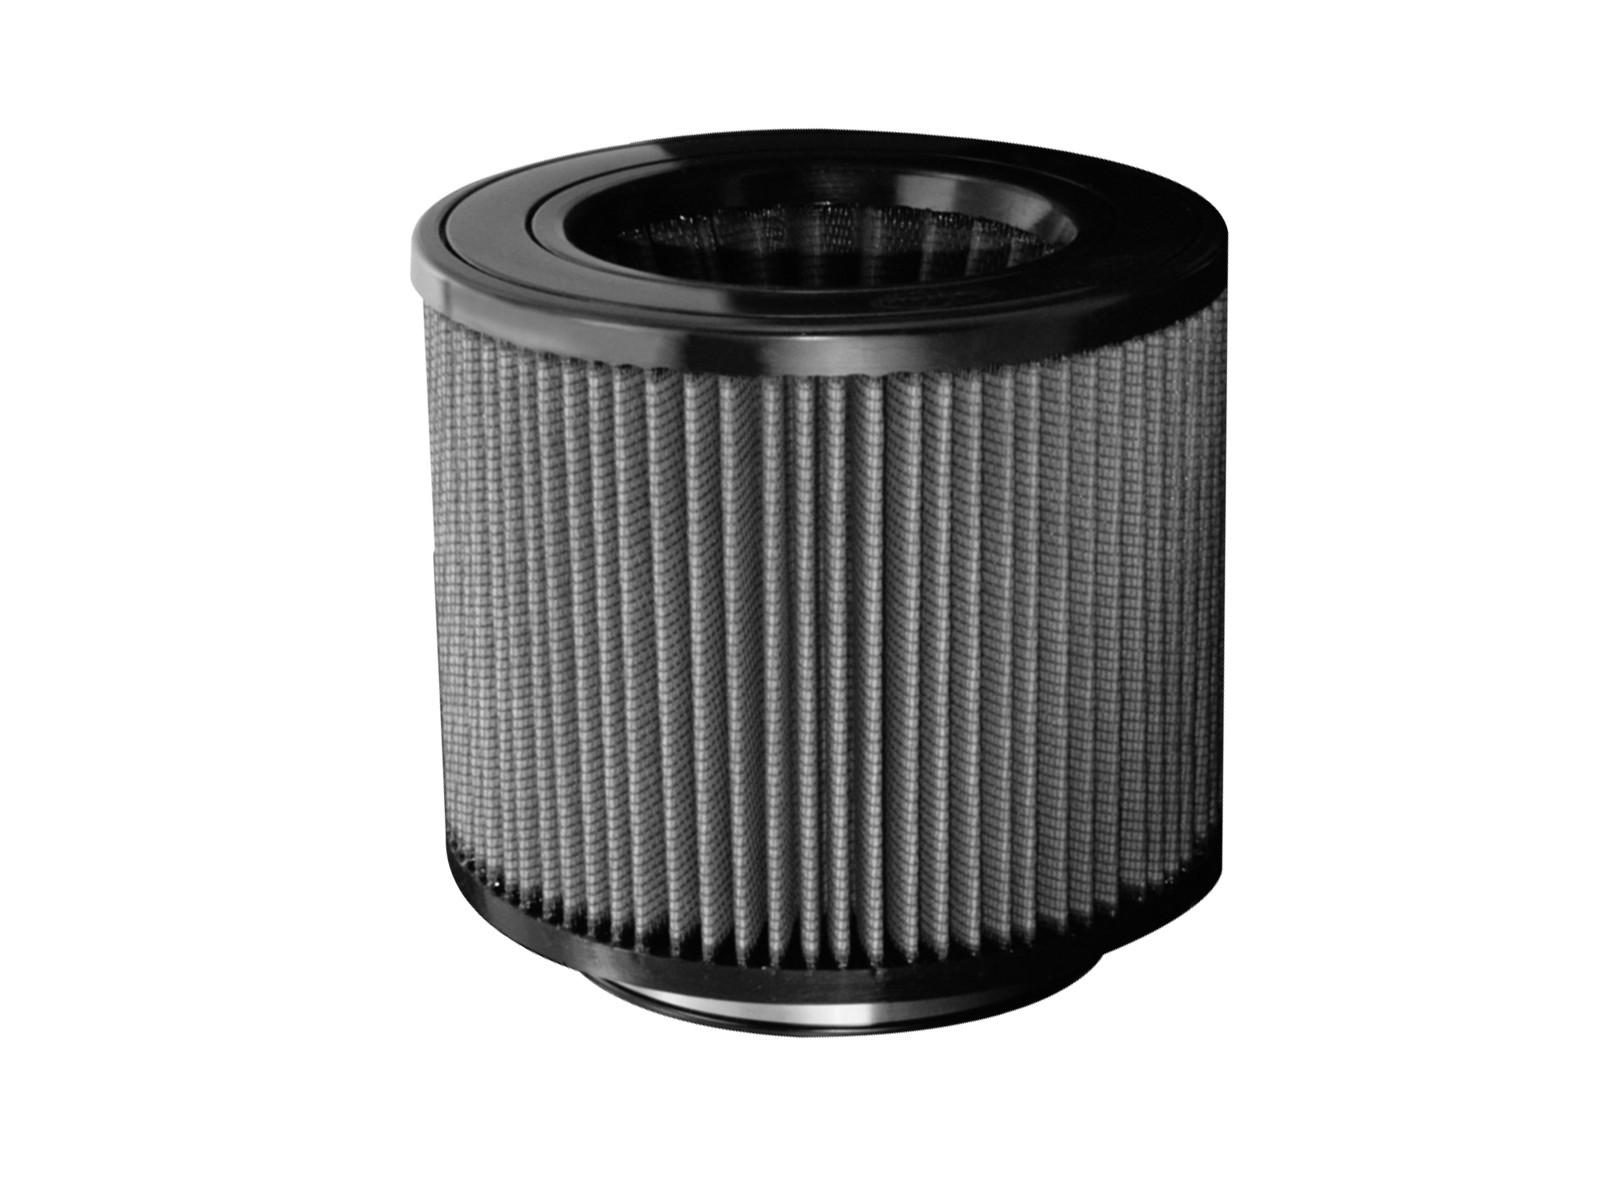 aFe POWER 21-91046 Magnum FLOW Pro DRY S Air Filter